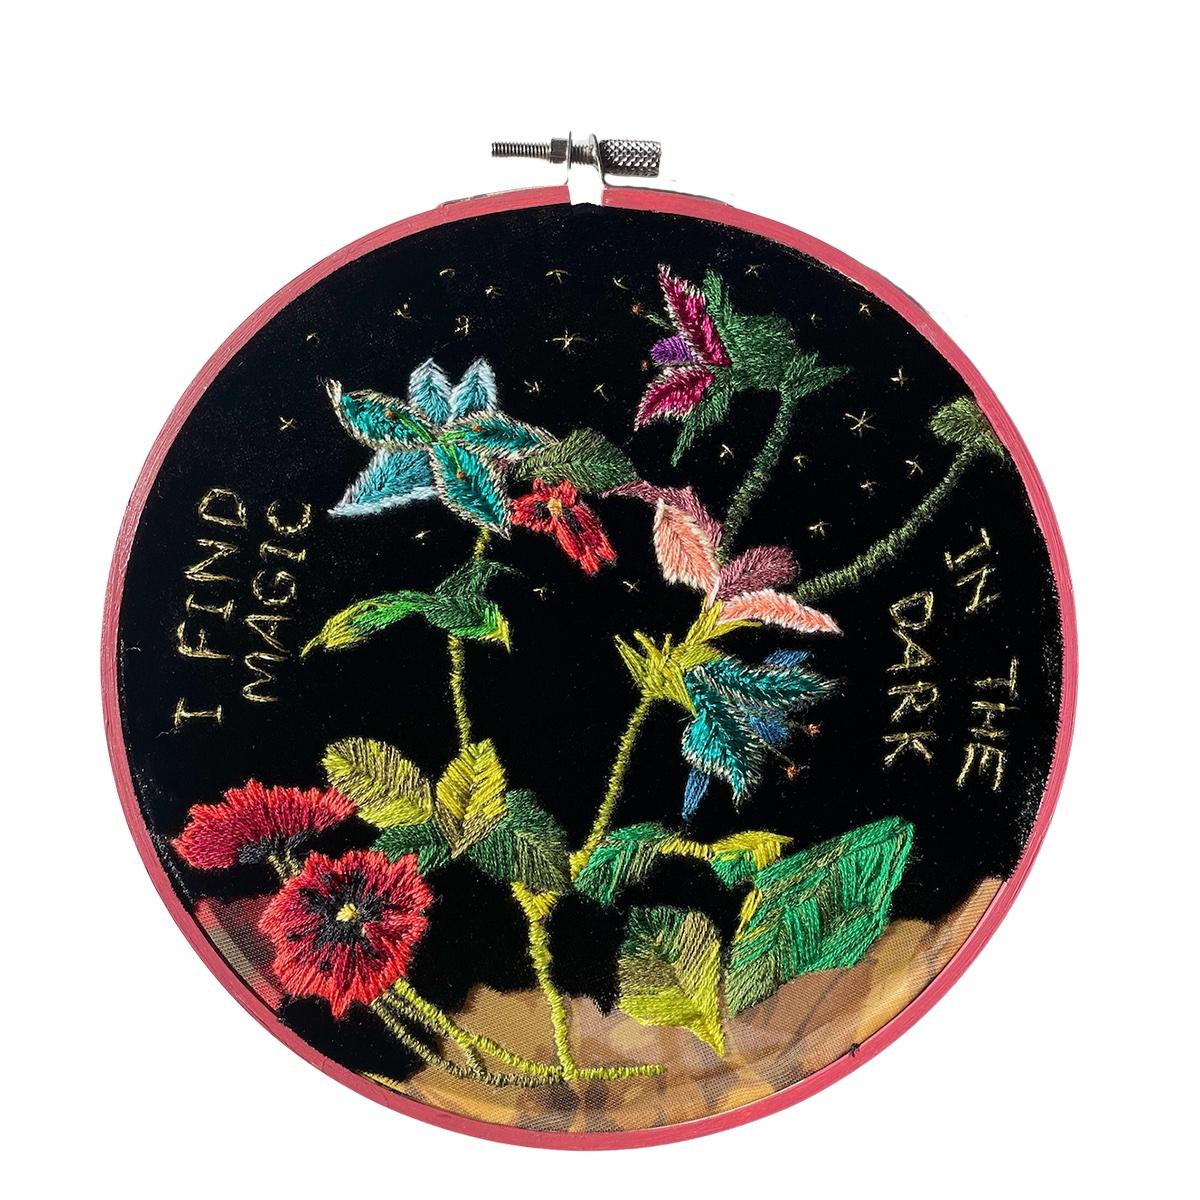 "Amber Mustafic Magic in the Darkness, 2021 Hand embroidery on velvet 7"" diameter"